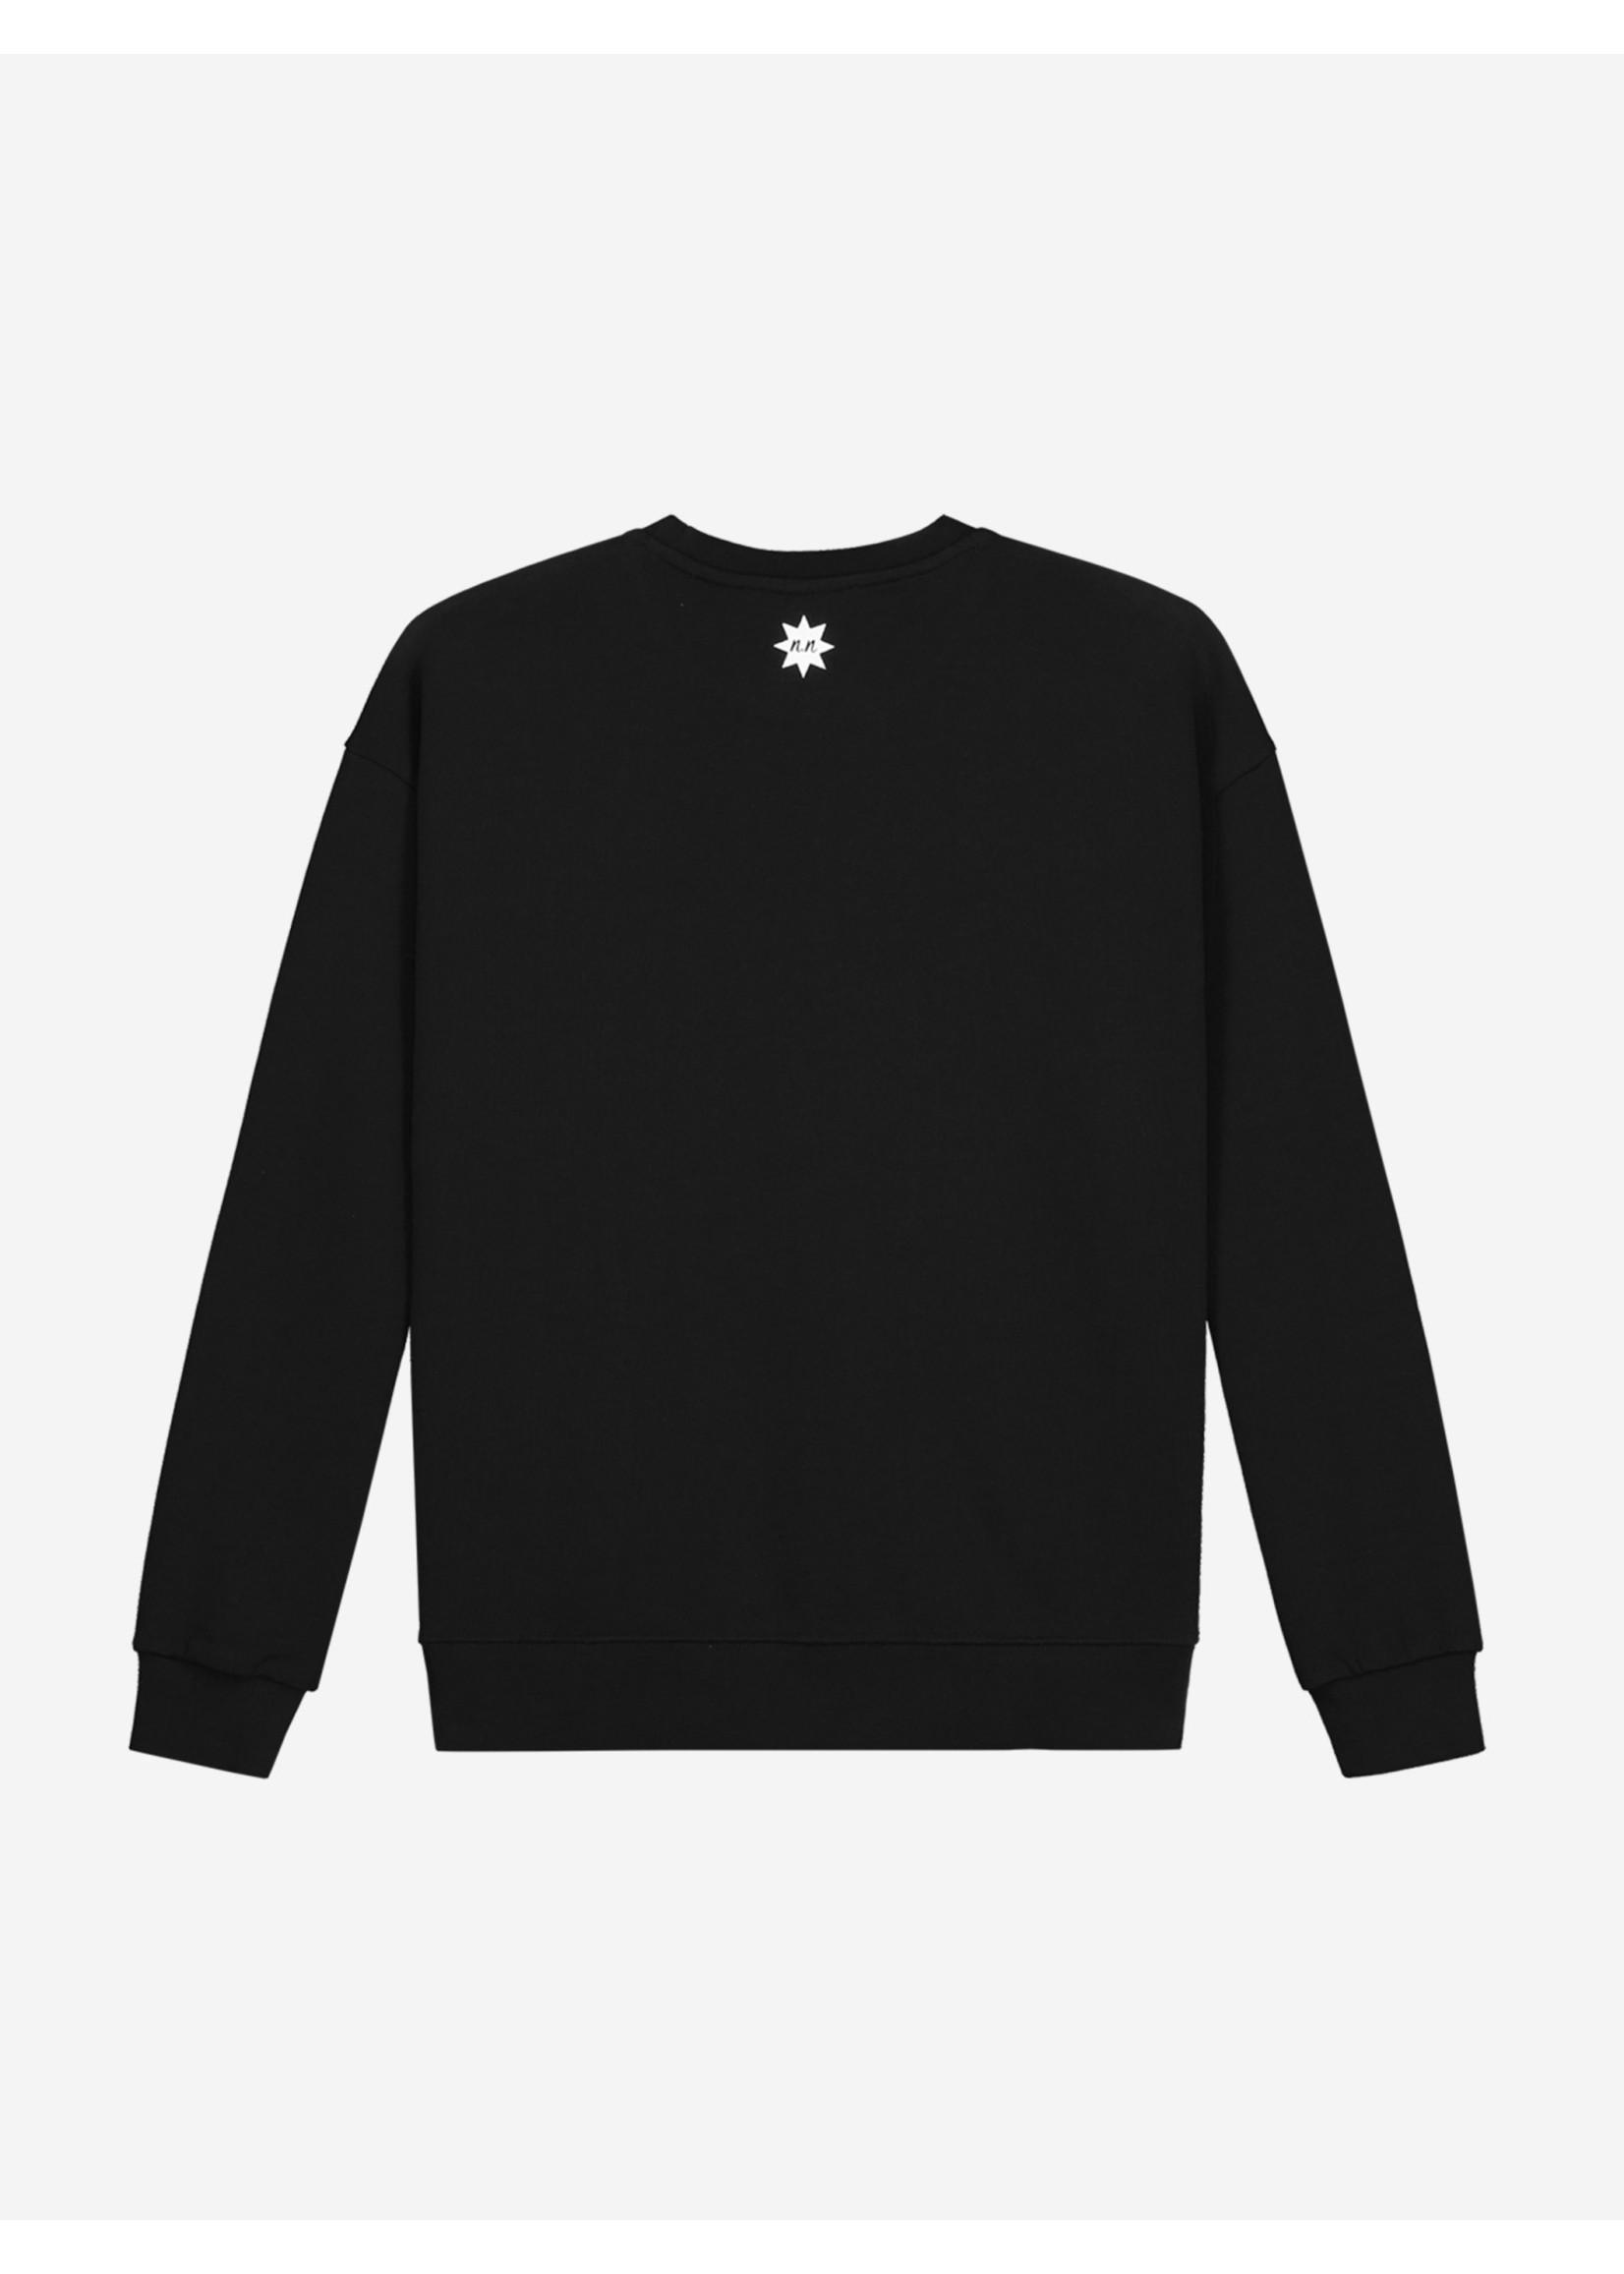 NIK&NIK Nik&Nik No Questions Sweater - Black